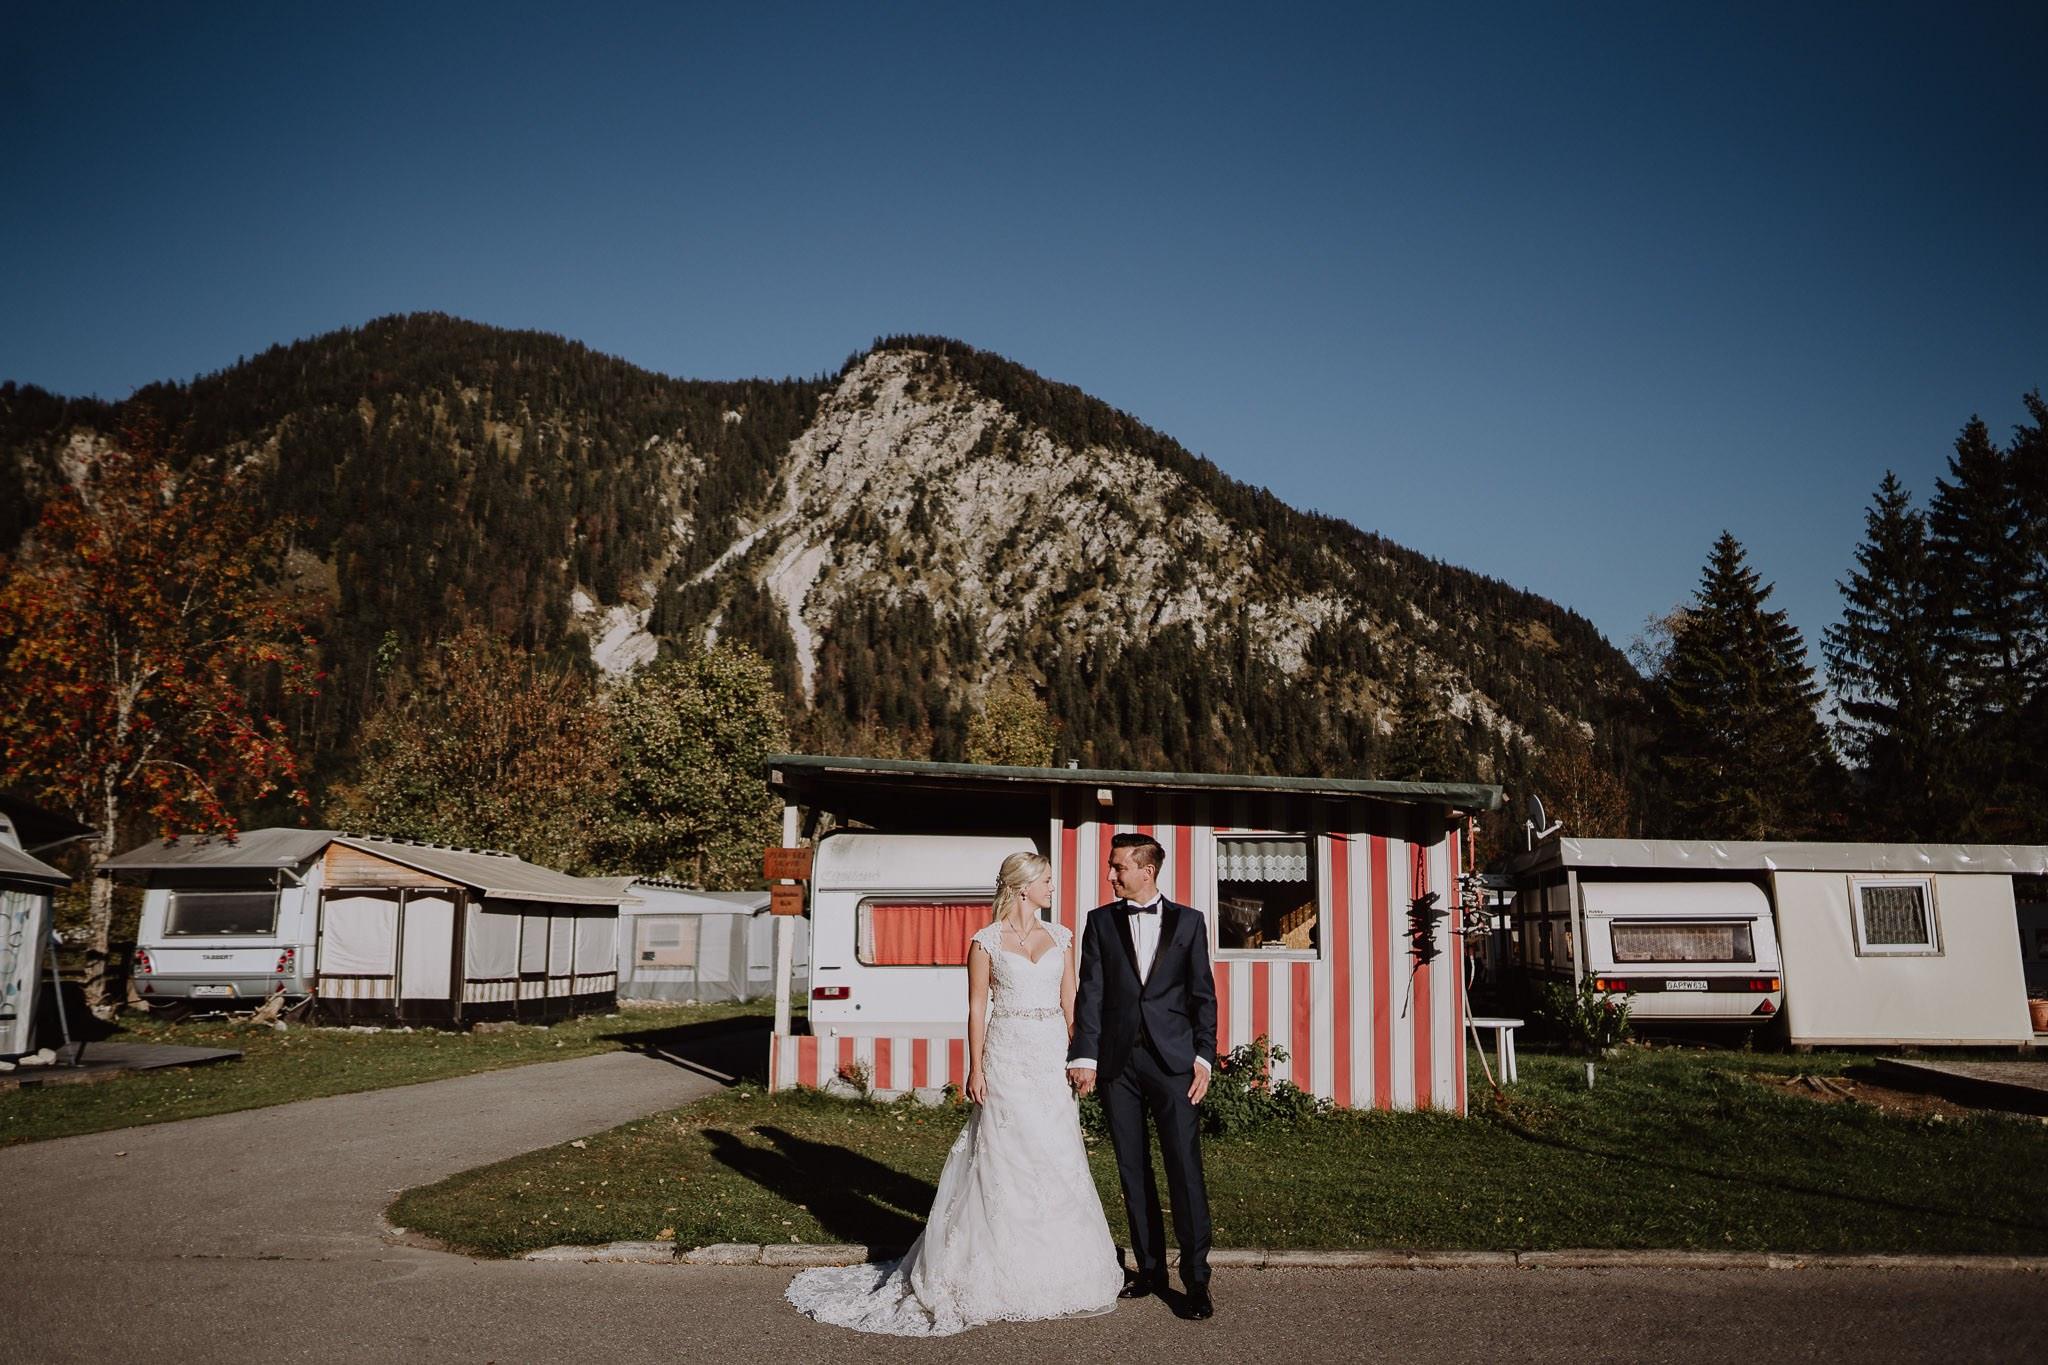 wedding photographer hamilton new zealand 7